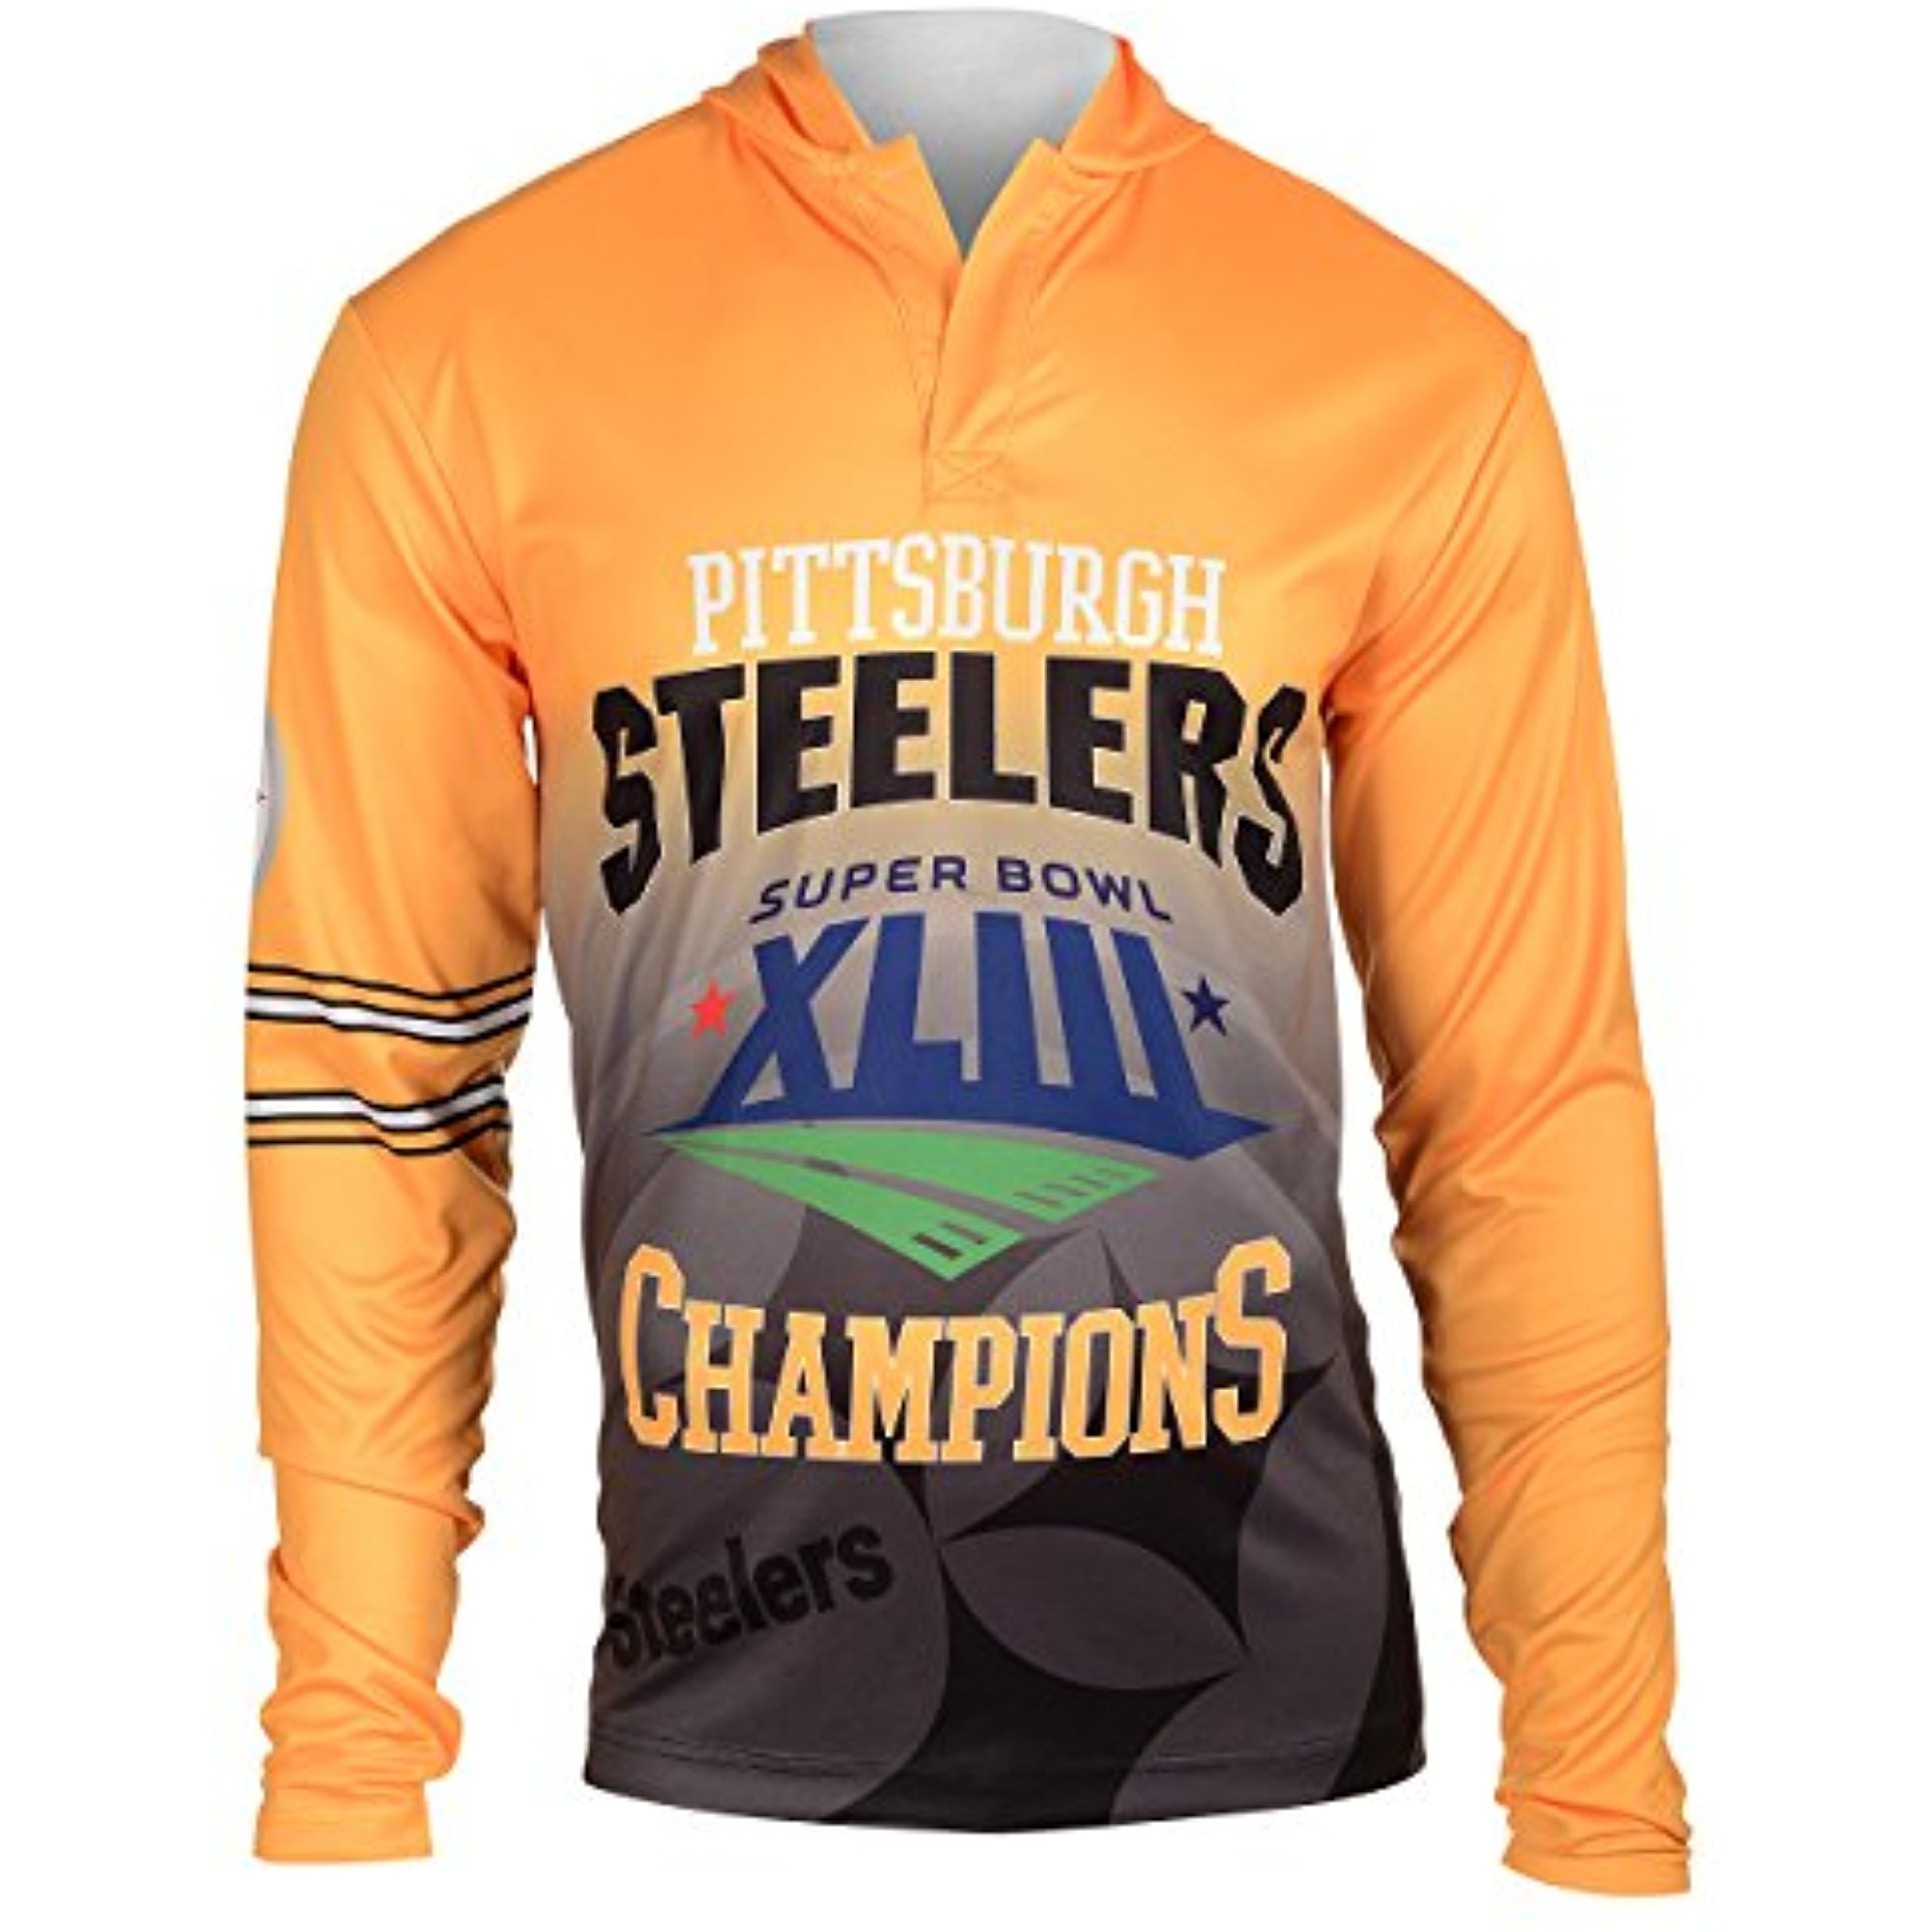 NFL Pittsburgh Steelers Super Bowl XLIII Champions Hoody Tee, Large